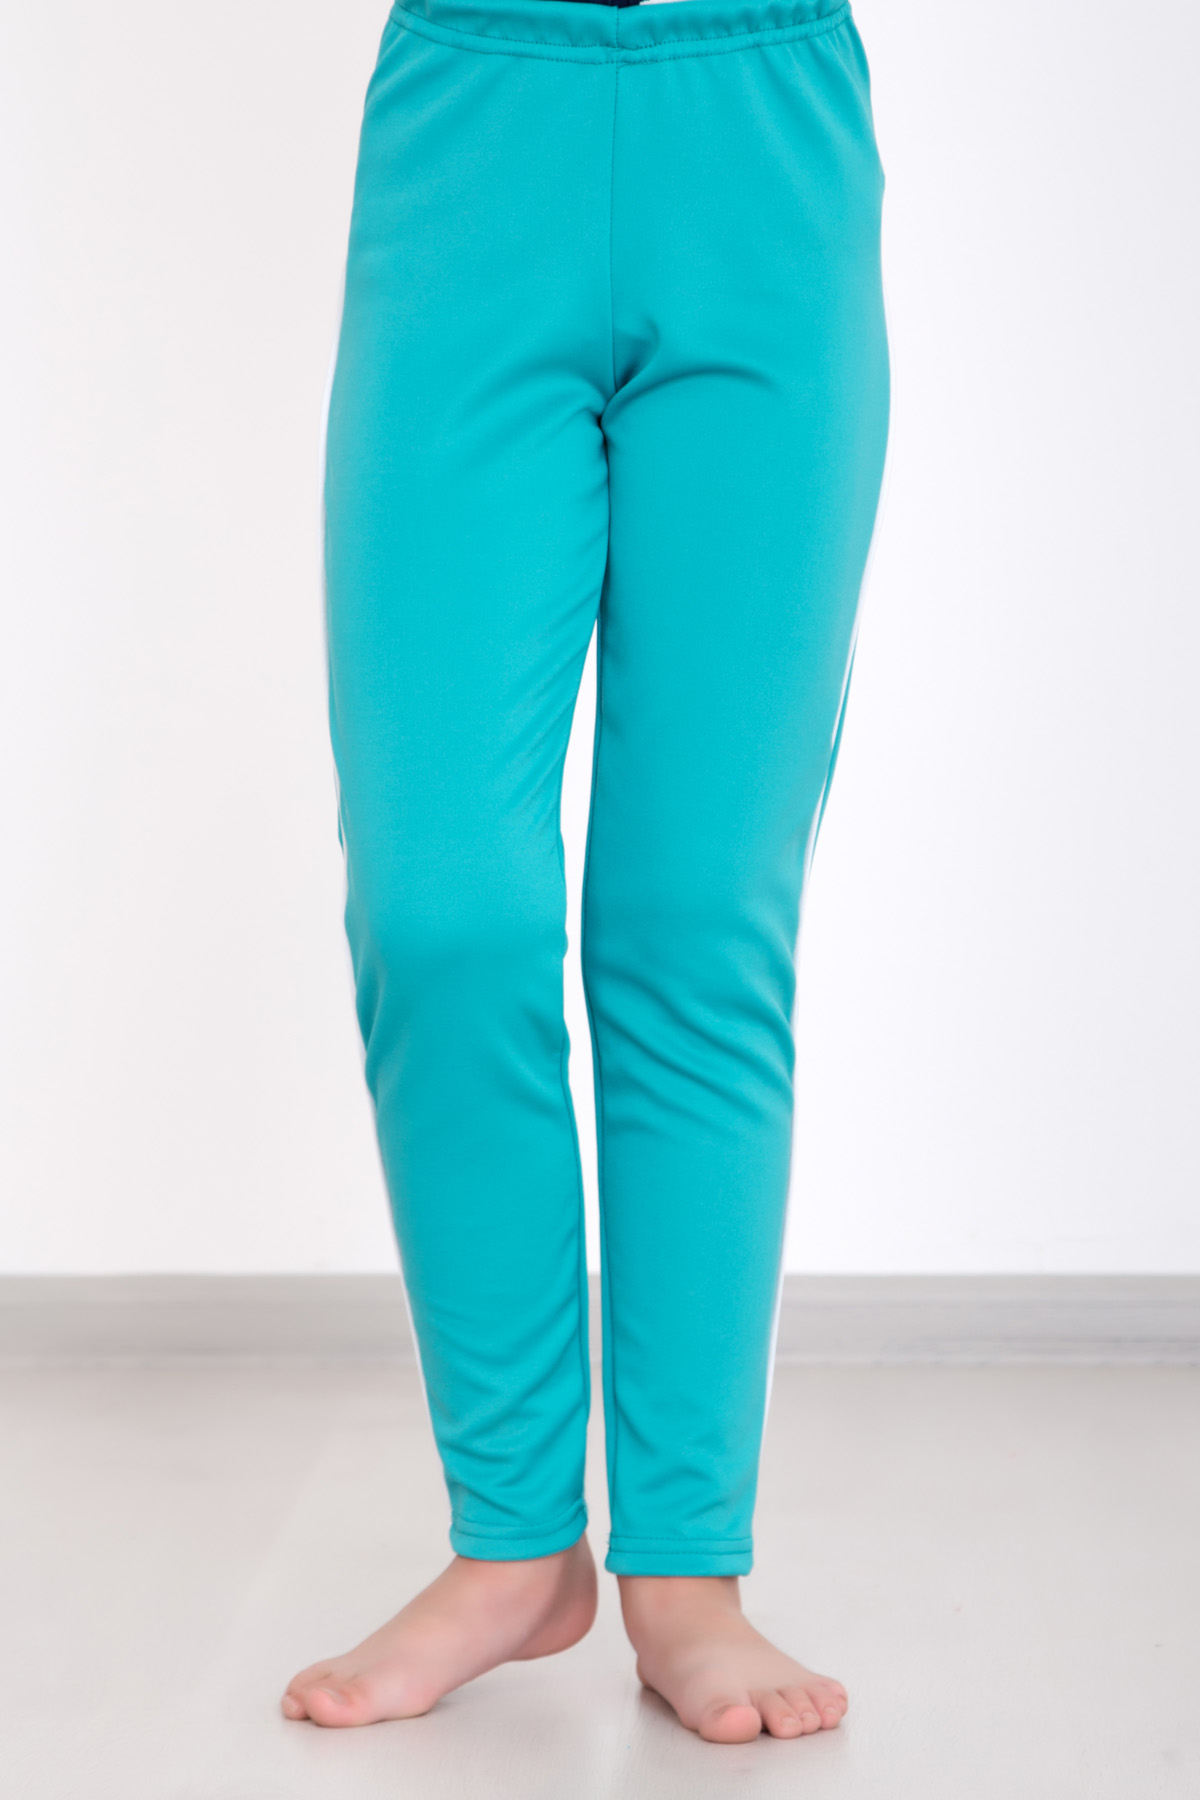 Дет. брюки Спорт Ментол р. 36Шорты, бриджи, брюки<br><br><br>Тип: Дет. брюки<br>Размер: 36<br>Материал: Полиэстер